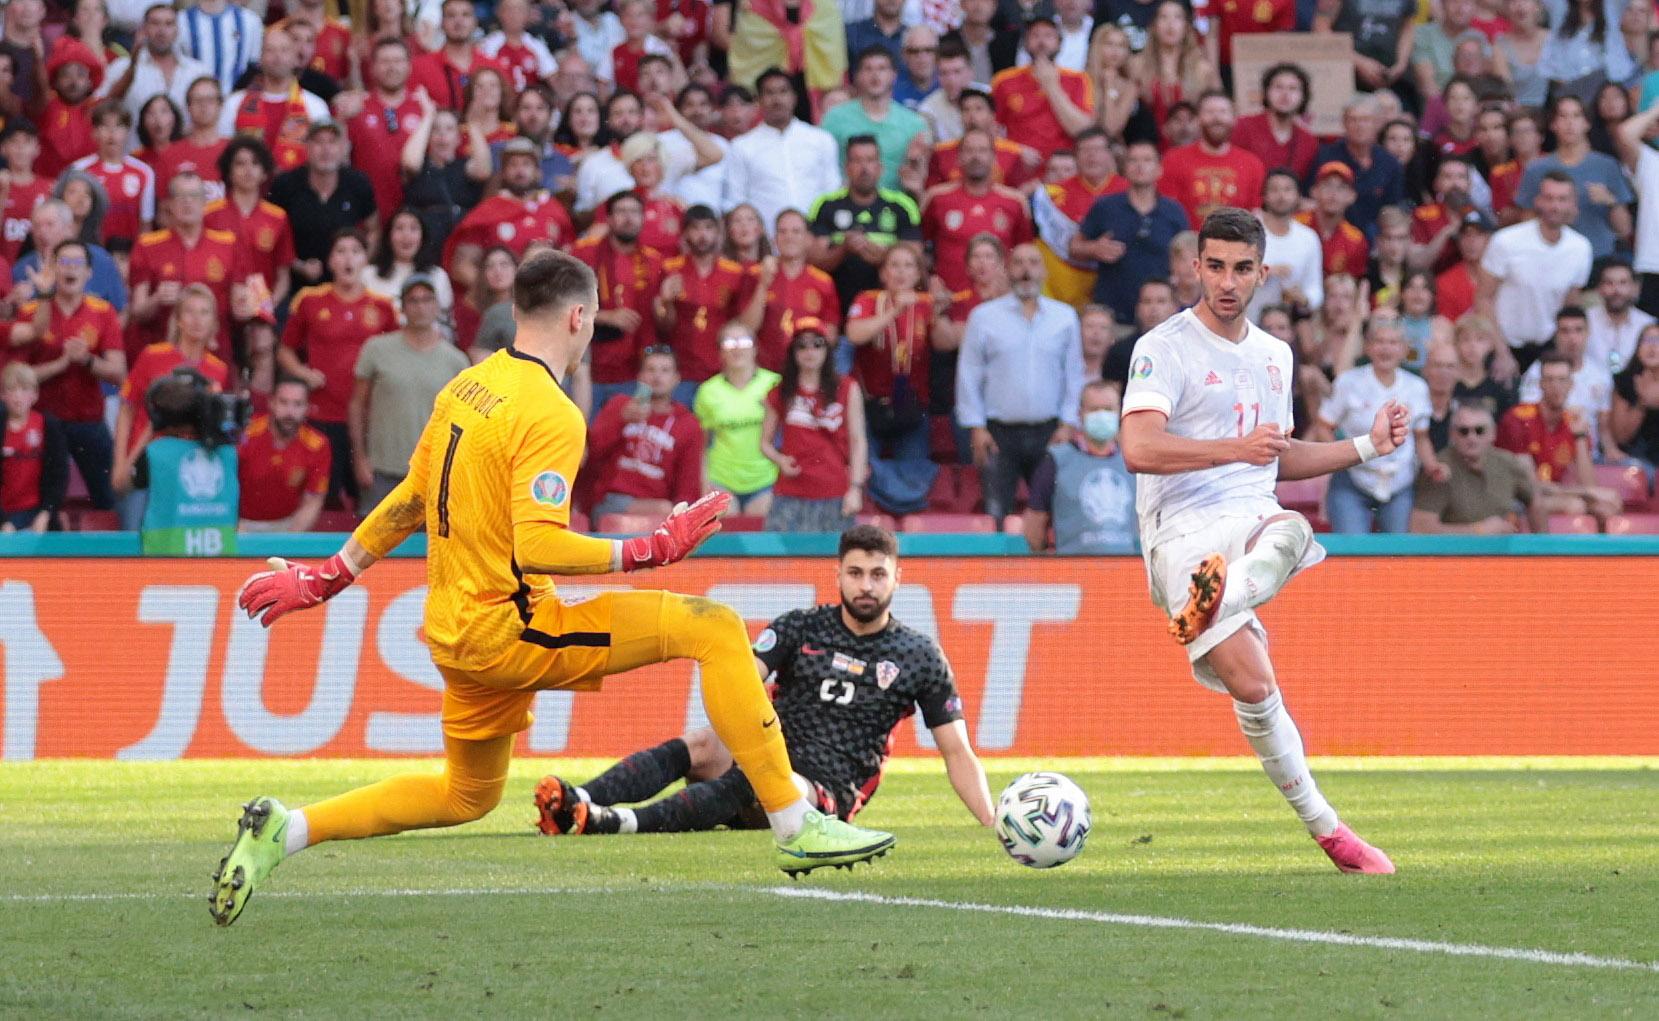 Euro 2020, Κροατία – Ισπανία: Τελευταία λεπτά με δυο γκολ και σασπένς